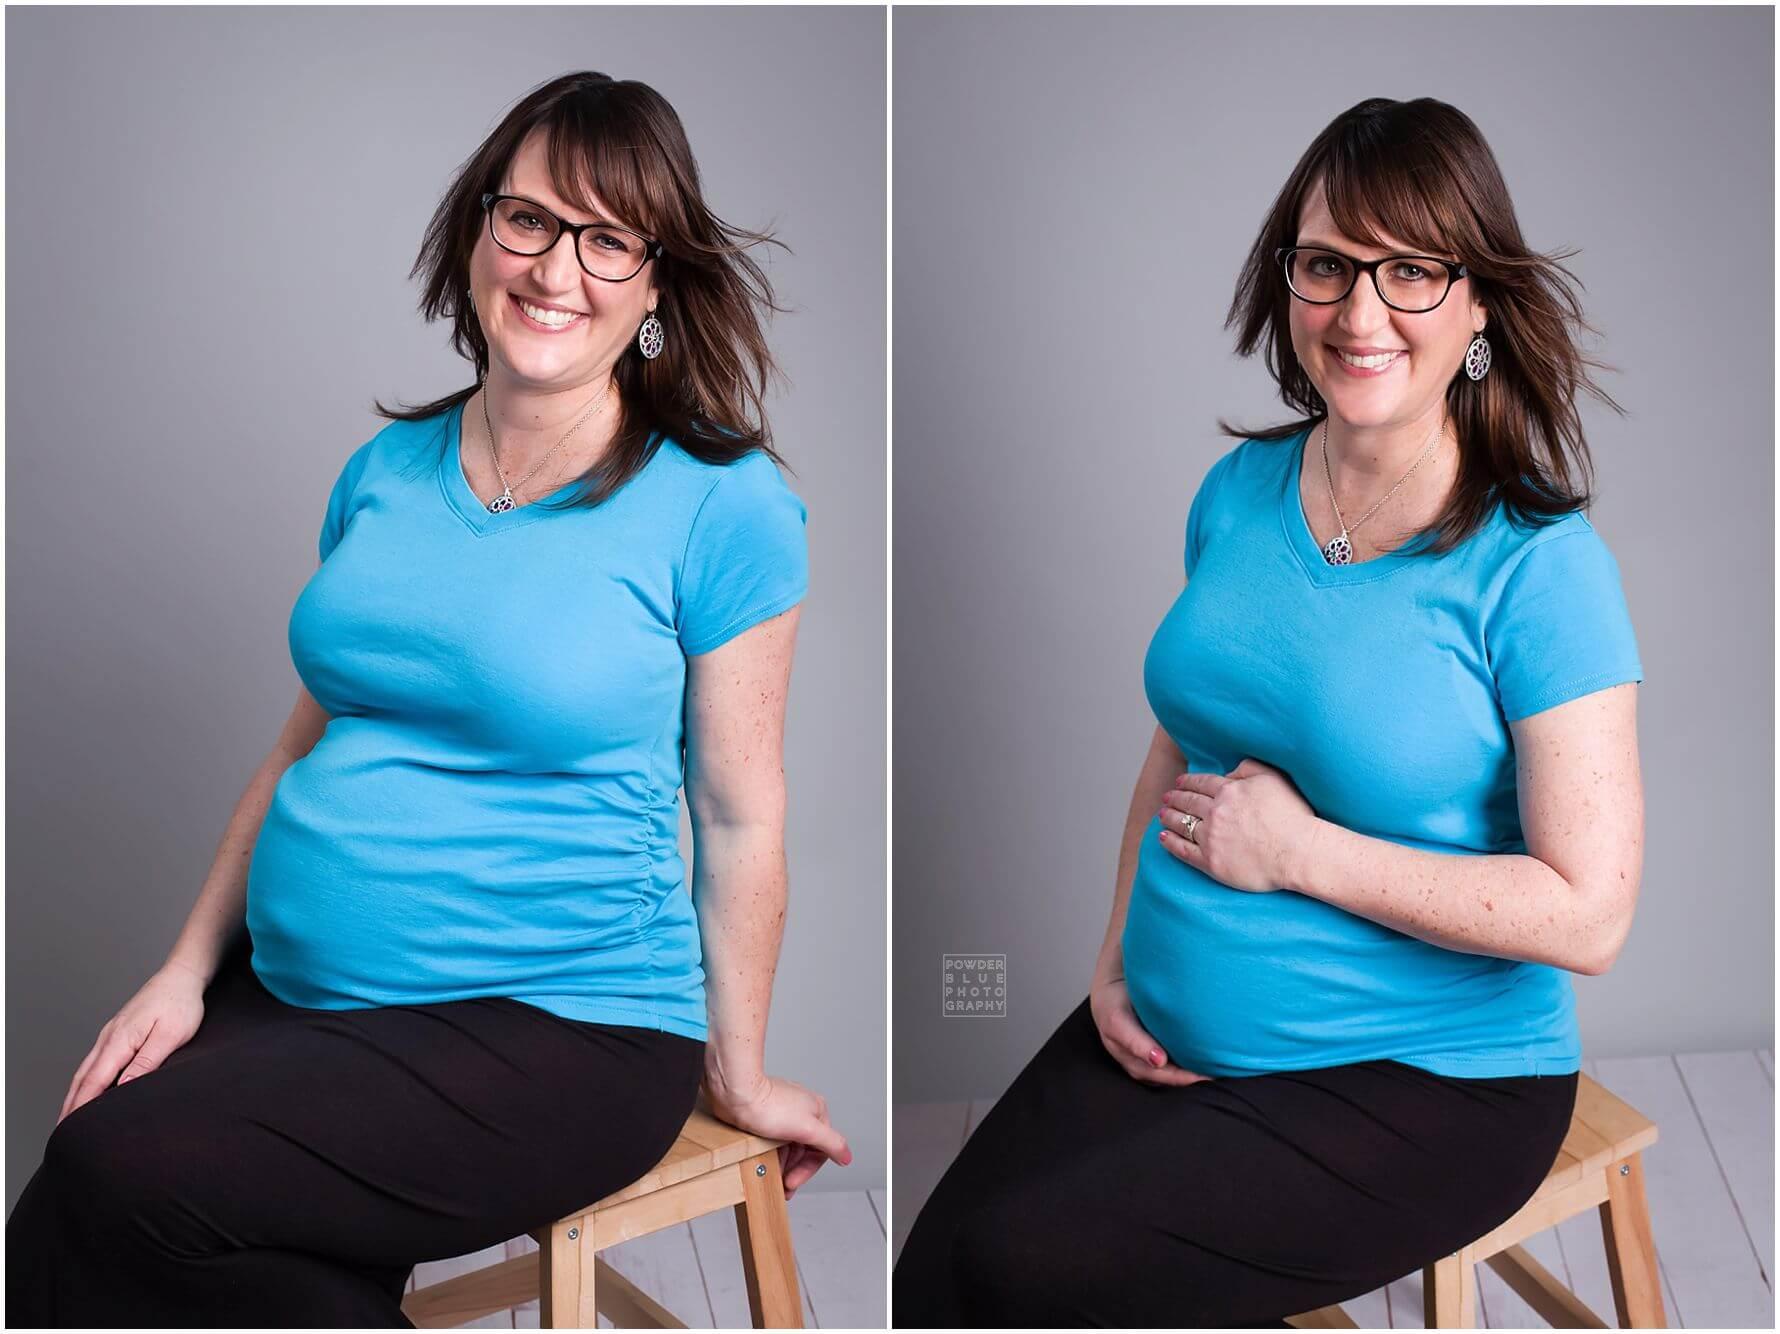 Powder Blue Photography: Pittsburgh Maternity Photographer